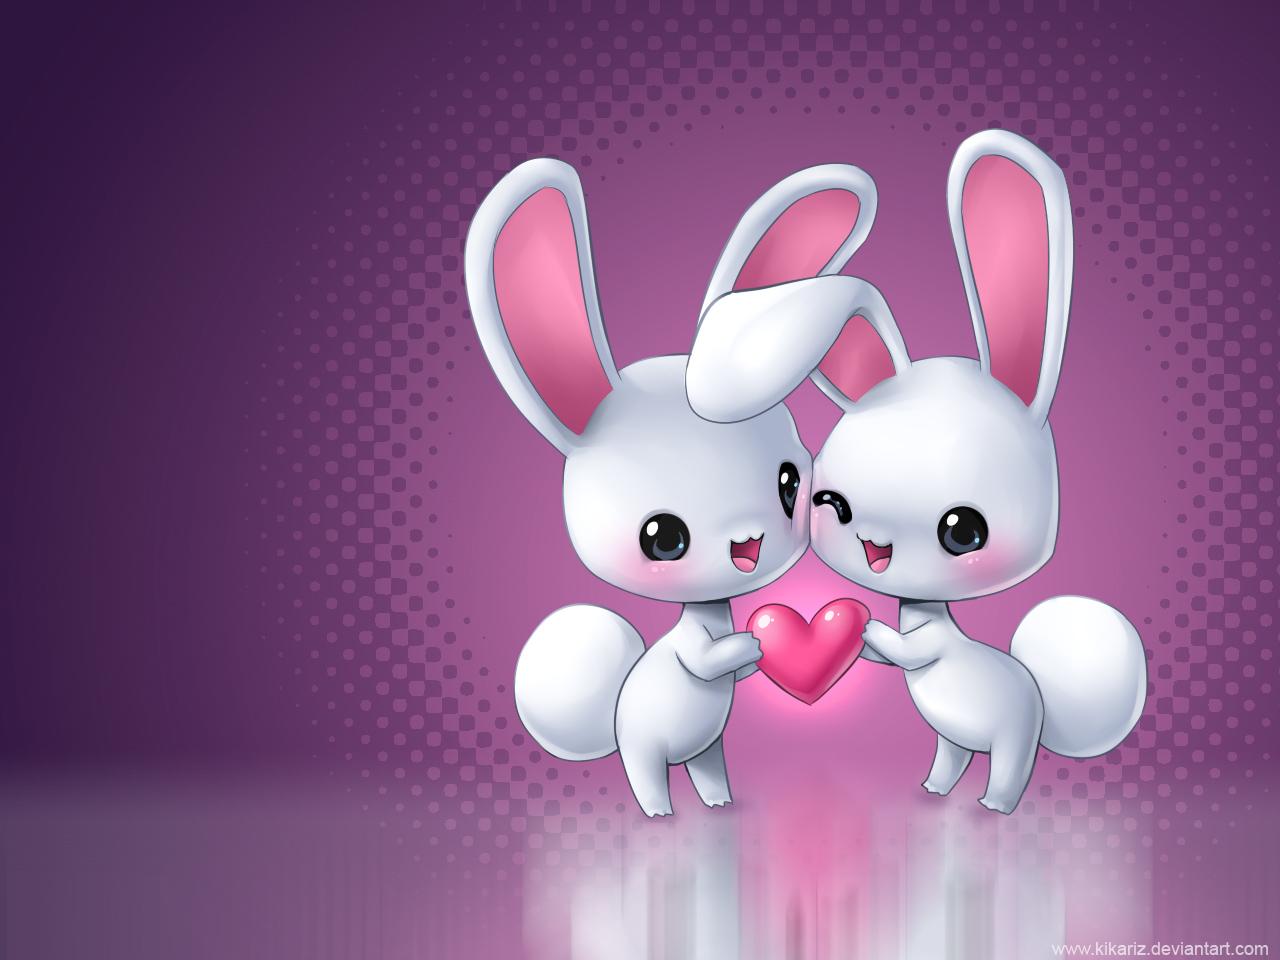 Free Download Wallpaper Love Love Wallpaper 31307651 1280x960